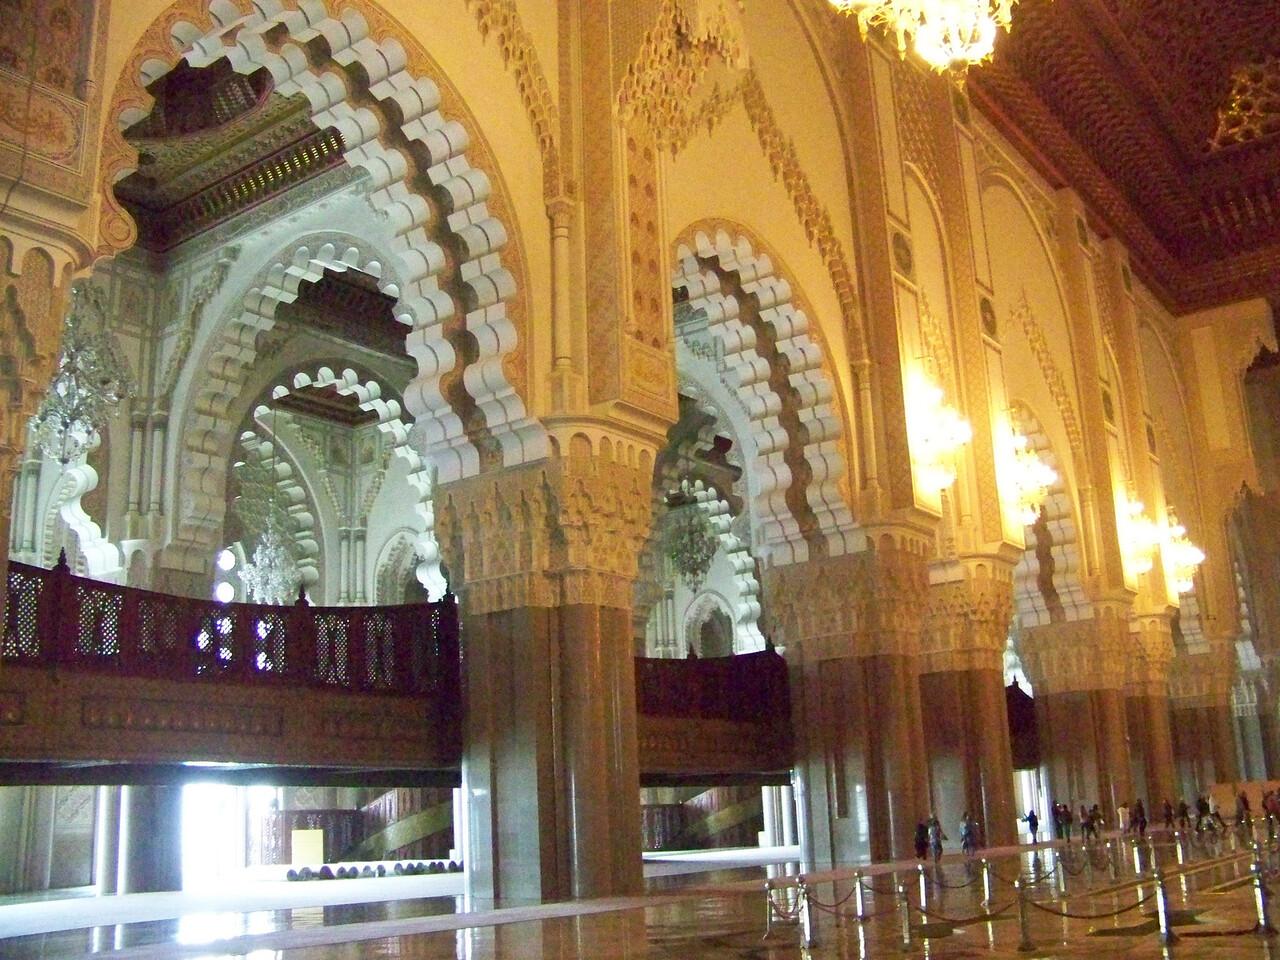 0012 - Hassan II Mosque - Casablanca Morocco.JPG